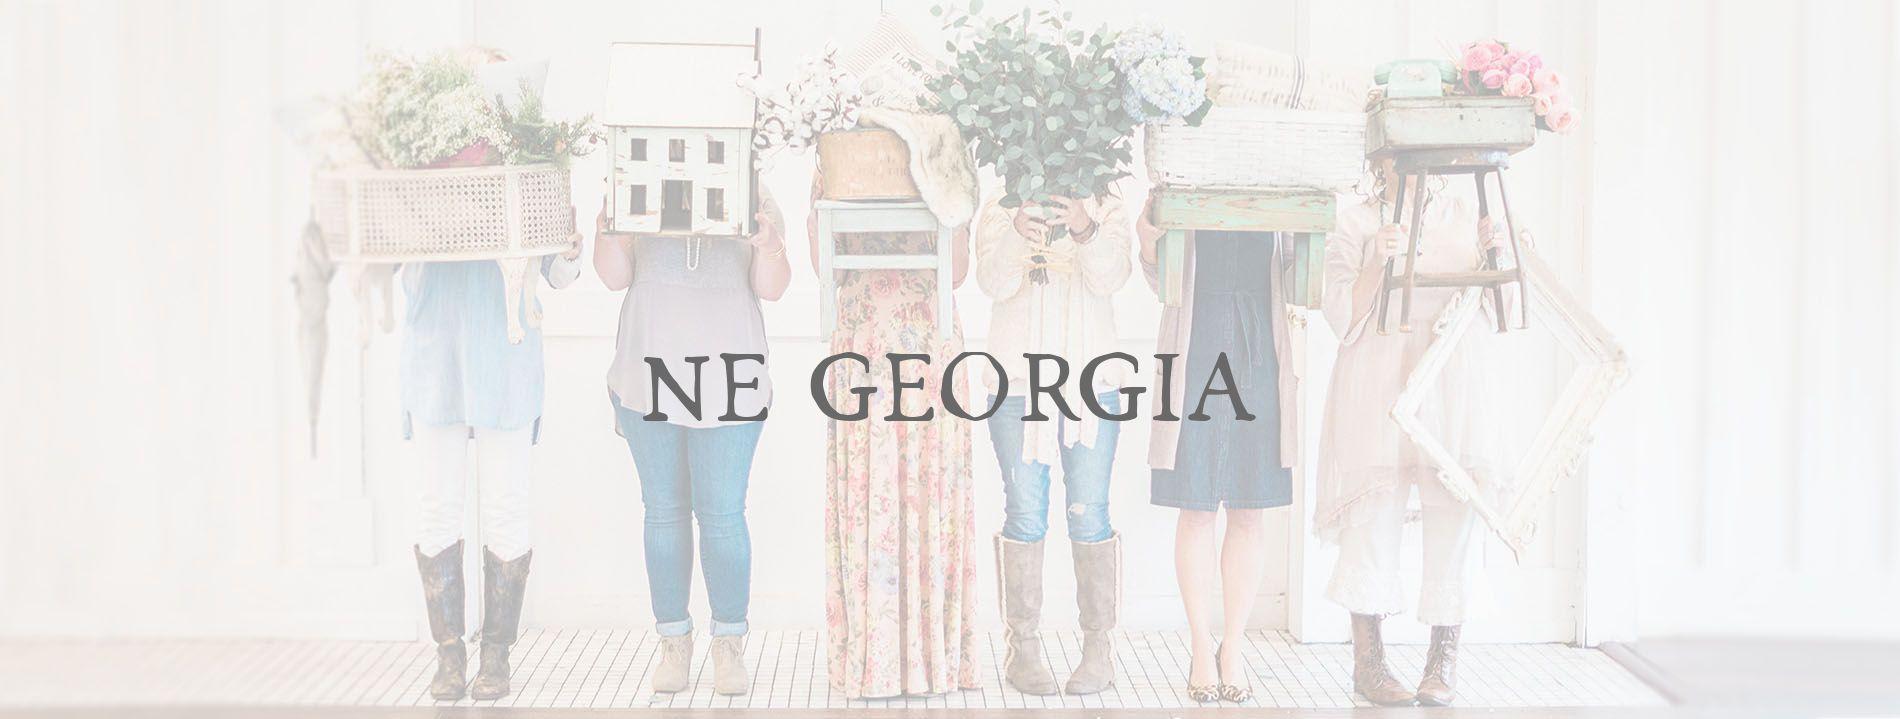 NE Georgia